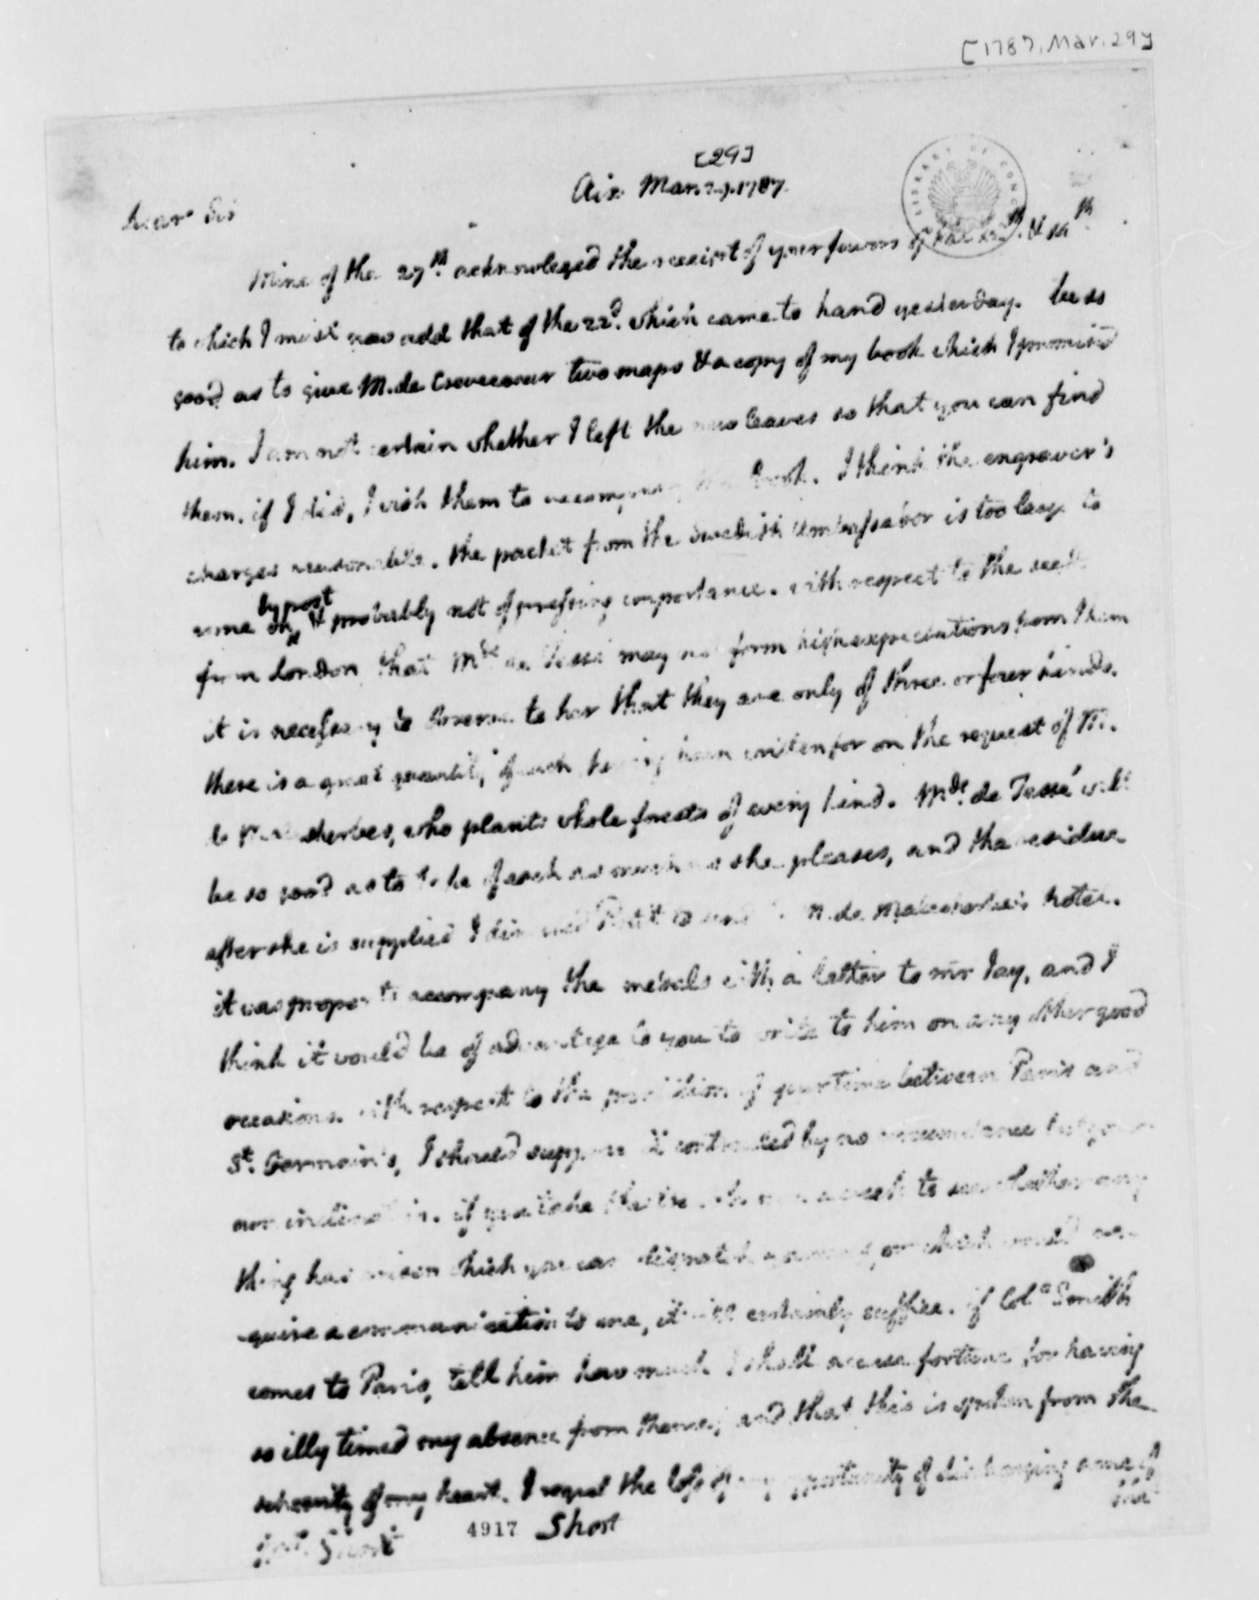 Thomas Jefferson to William Short, March 29, 1787